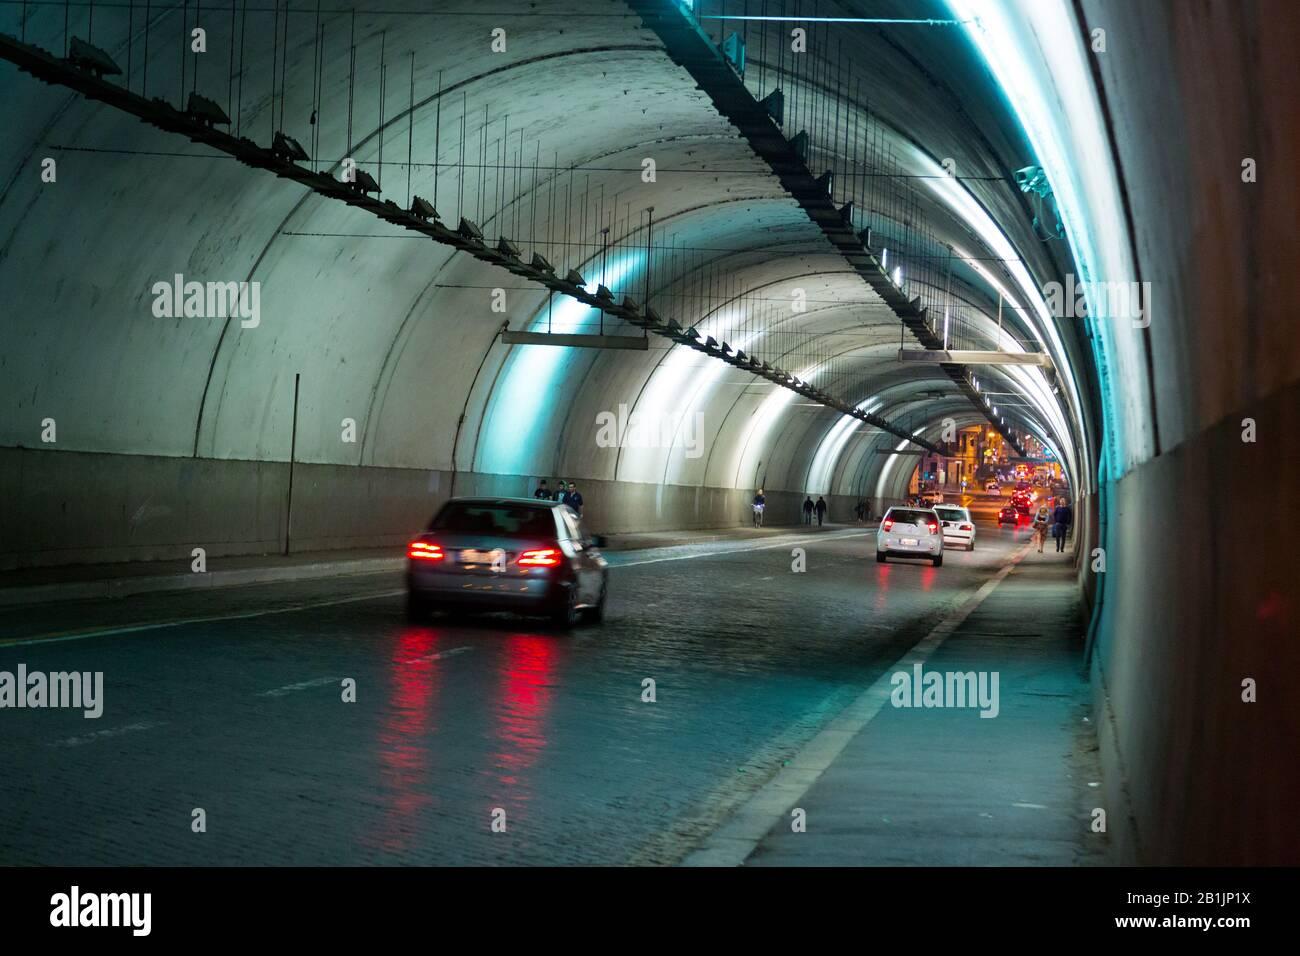 Traforo Umberto (tunnel) in Rome, Italy Stock Photo